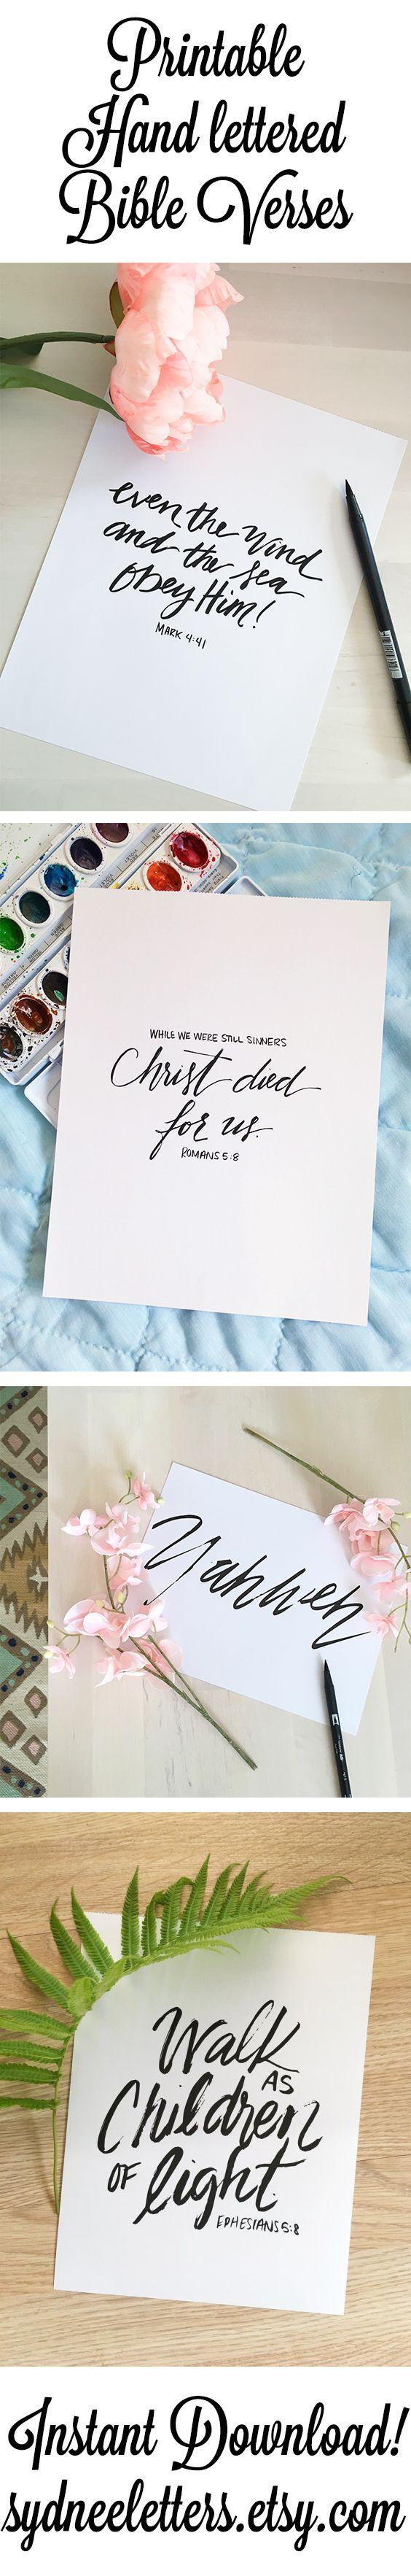 183 best Wedding images on Pinterest | Wedding ideas, Weddings and ...